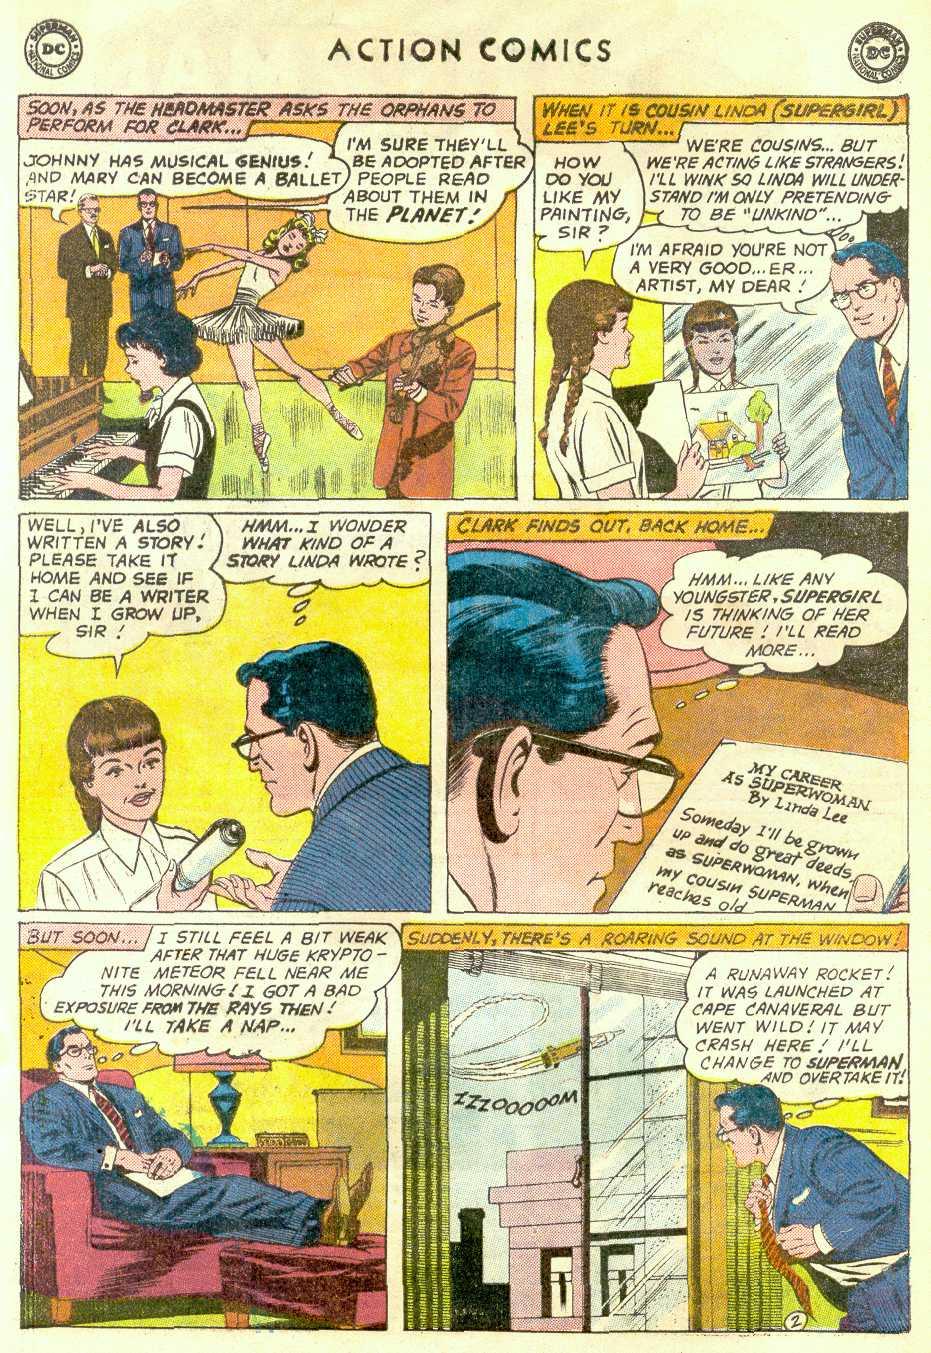 Action Comics (1938) 270 Page 3